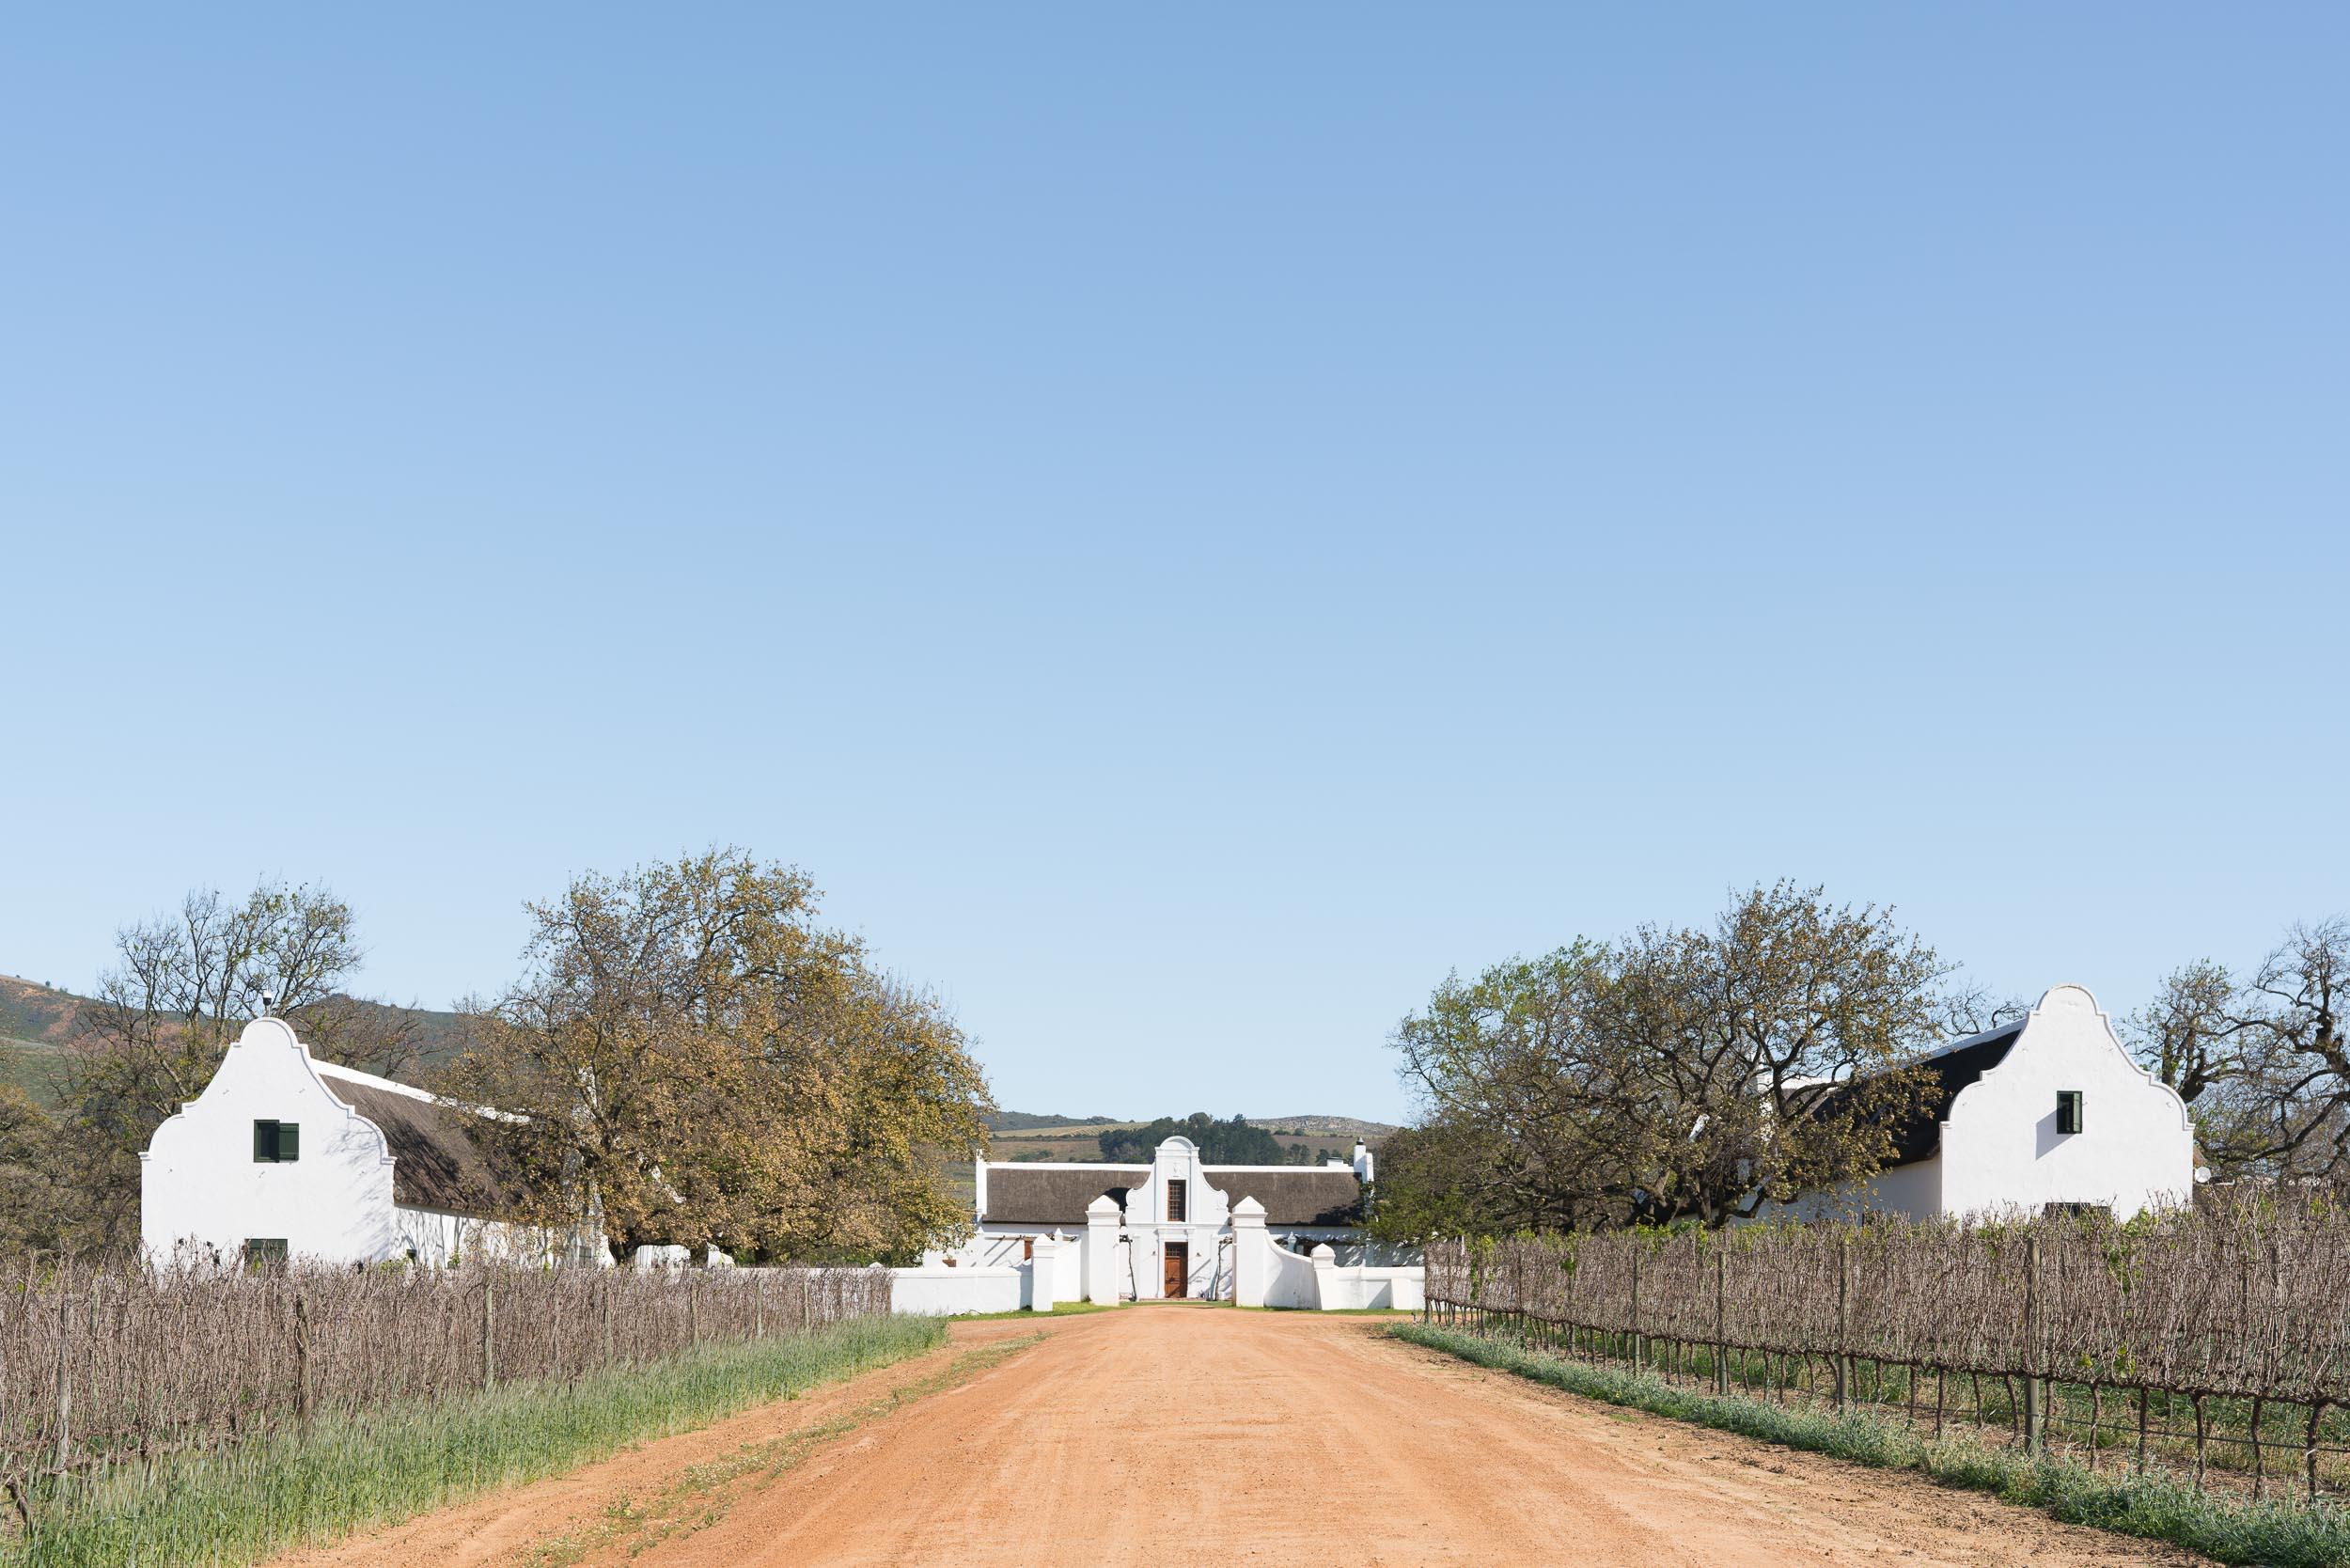 the_getaway_edit_south_africa_cape_winelands_babylonstoren-3.jpg